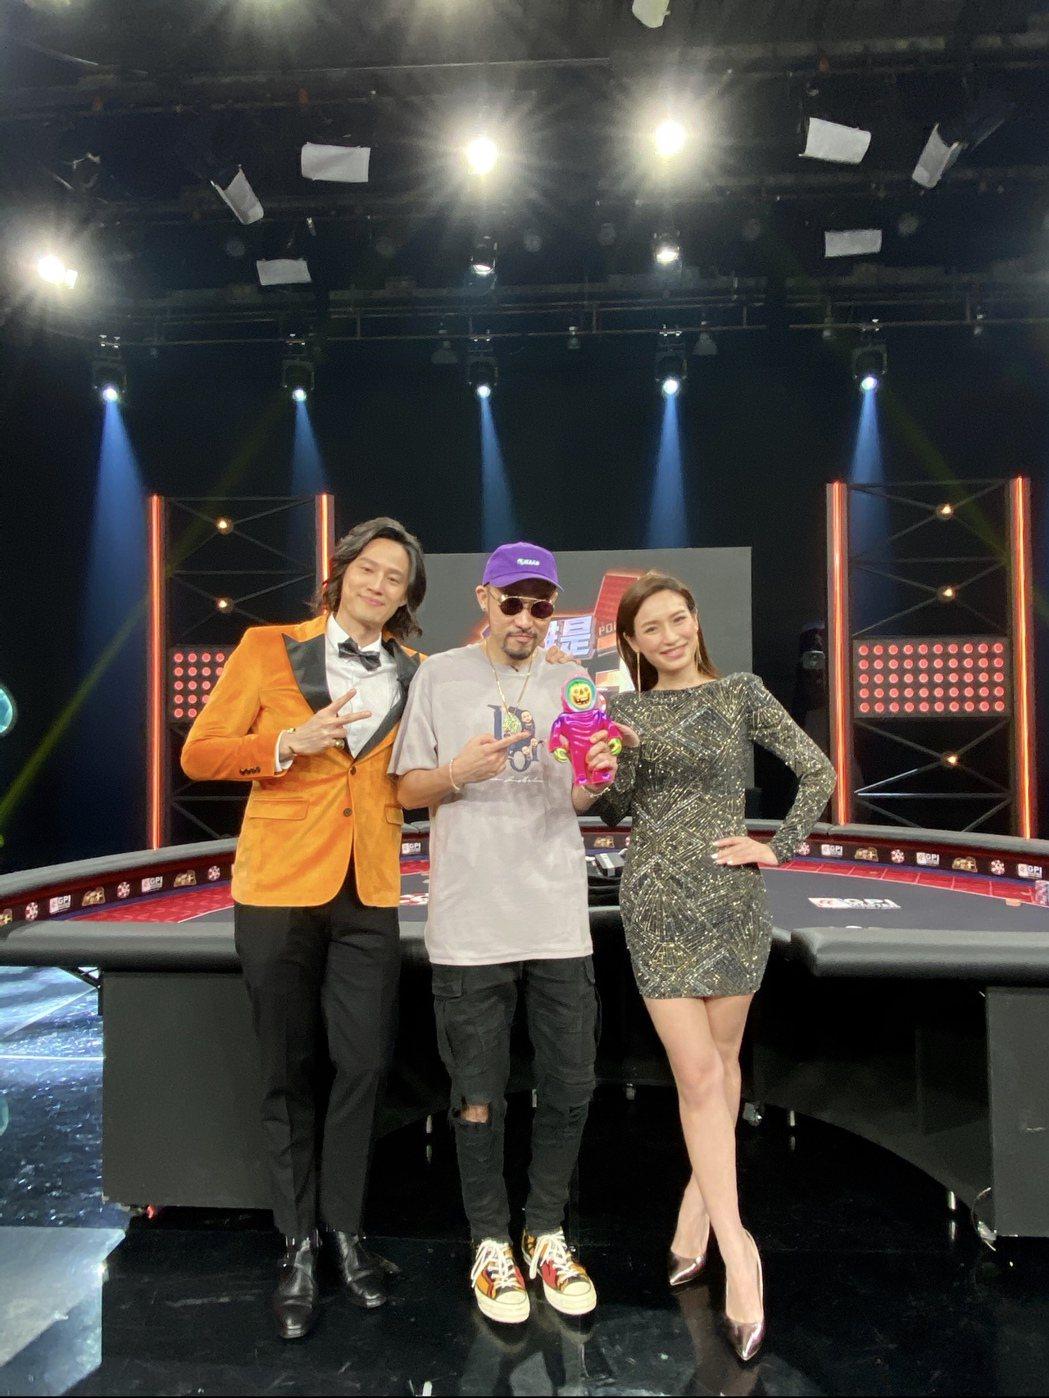 MC HotDog(中)上「誰是撲克王」。圖/東風衛視提供